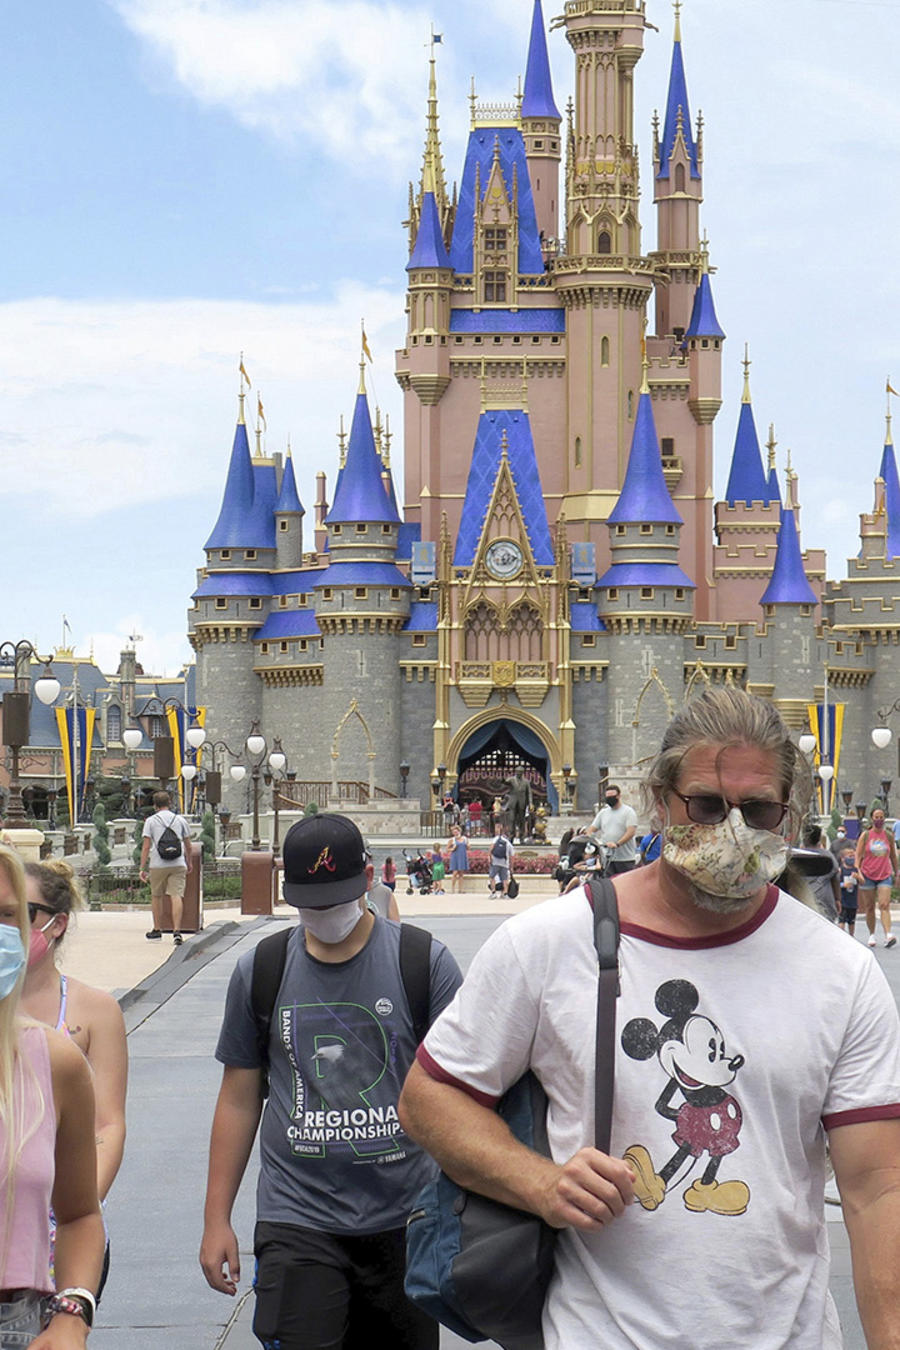 Visitantes del parque Magic Kingdom de Walt Disney World, en Lake Buena Vista, Florida.